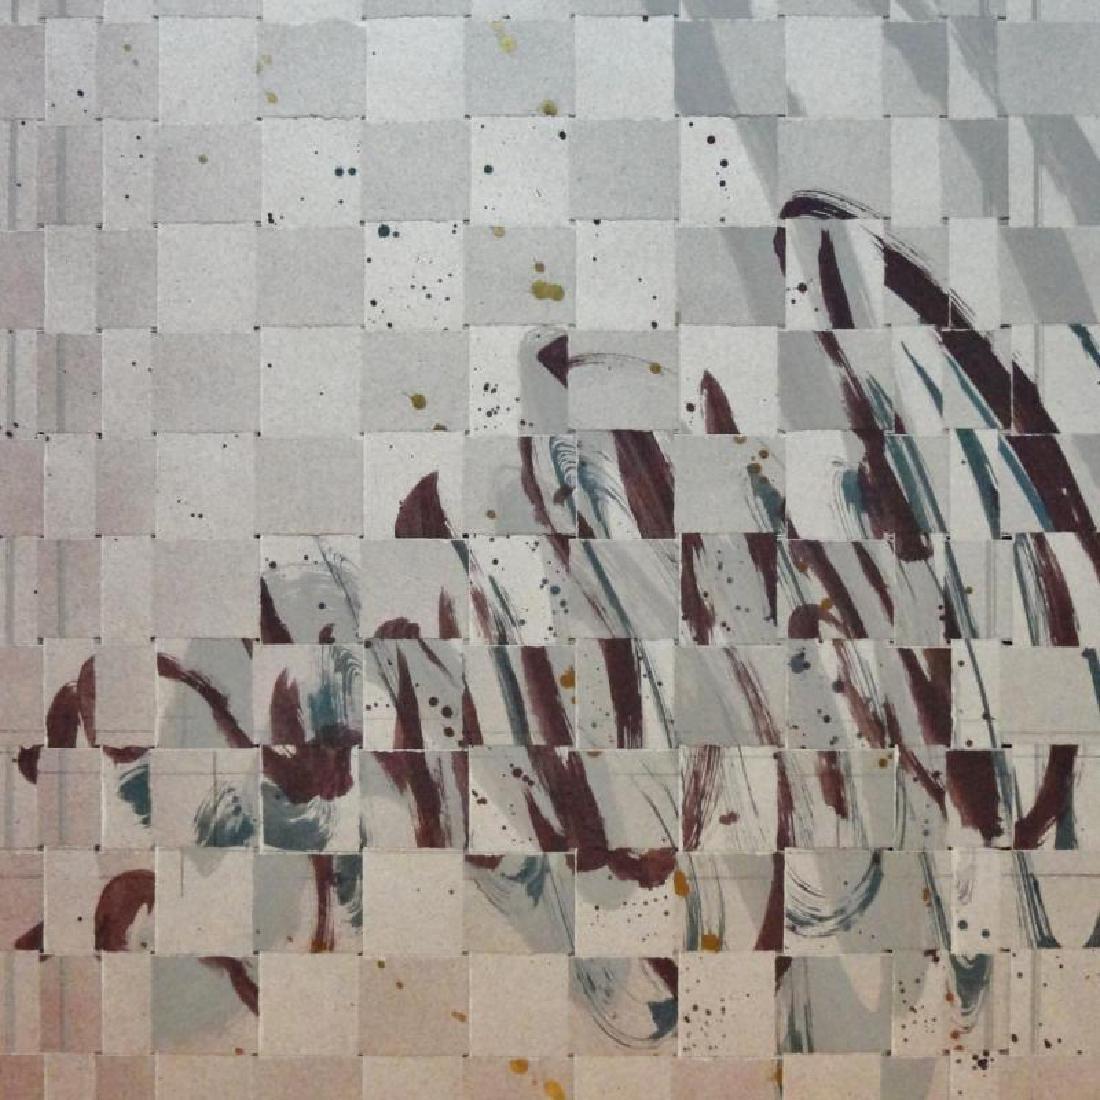 2 Piece Textured Weaved Mixed Media Abstract Modern Art - 4